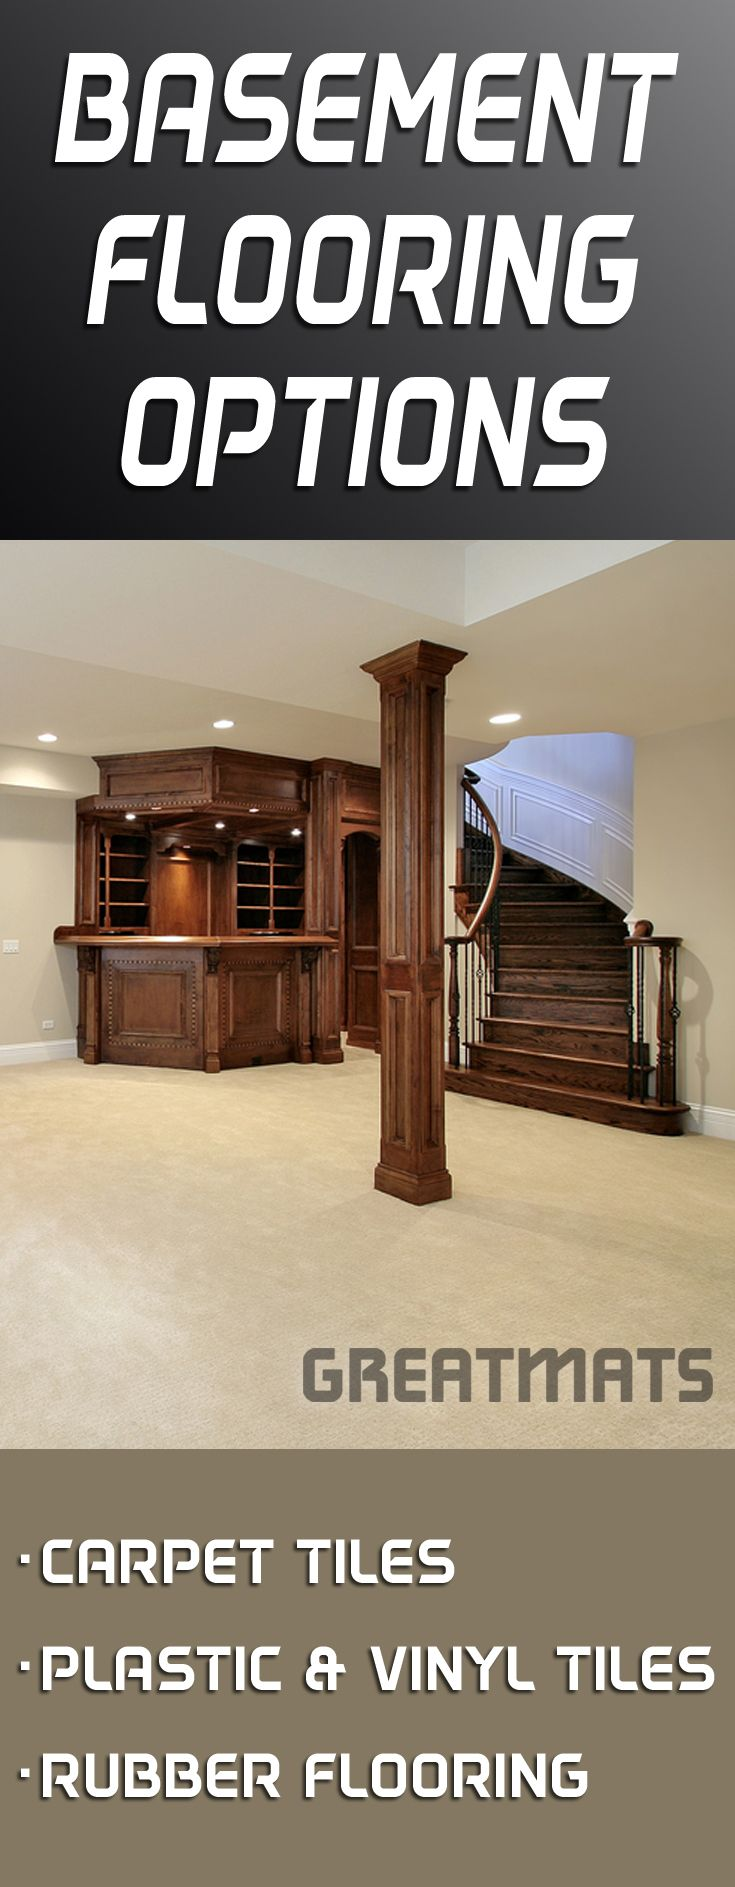 Best  Basement Flooring Ideas On Pinterest - Unlevel basement floor